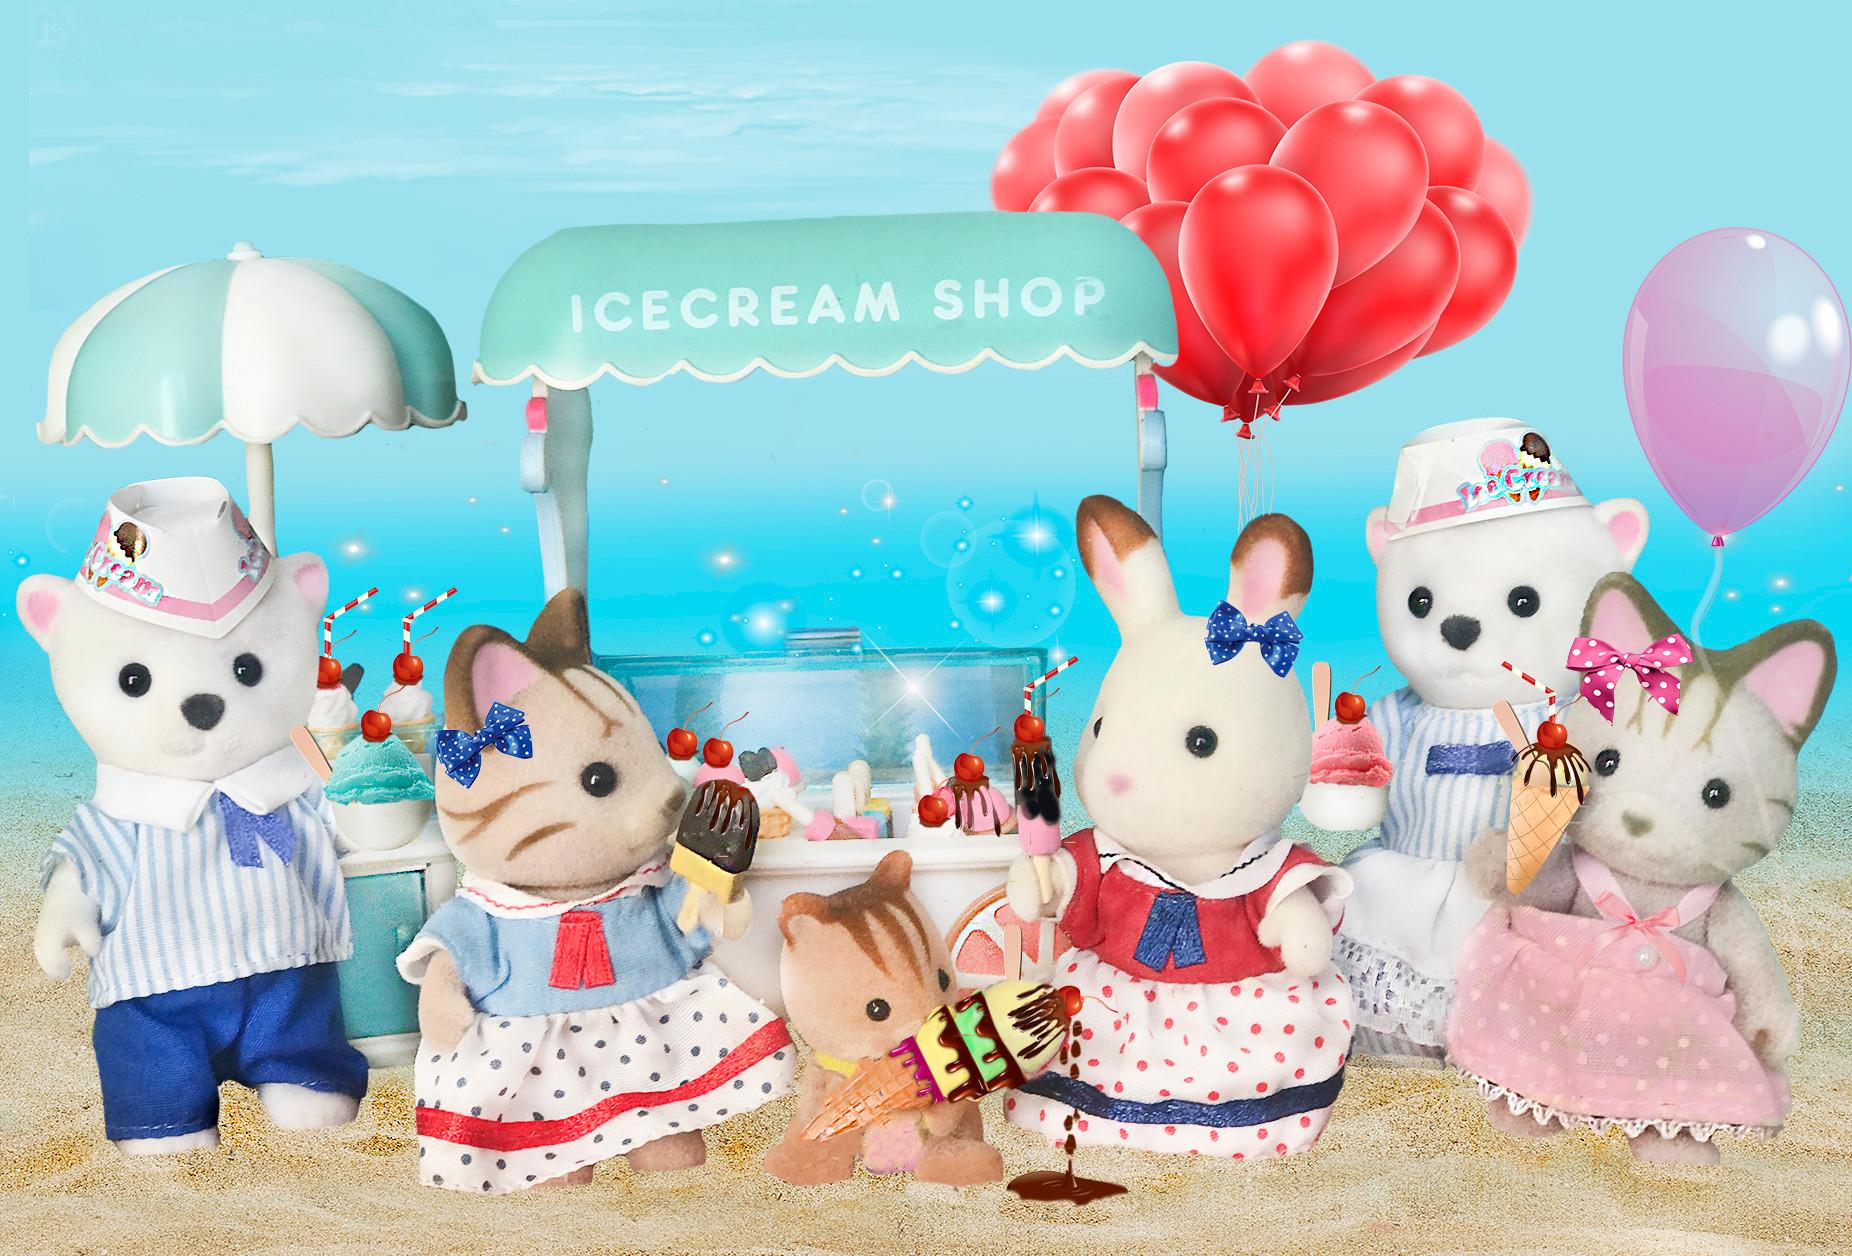 Buying ice cream, yummy!